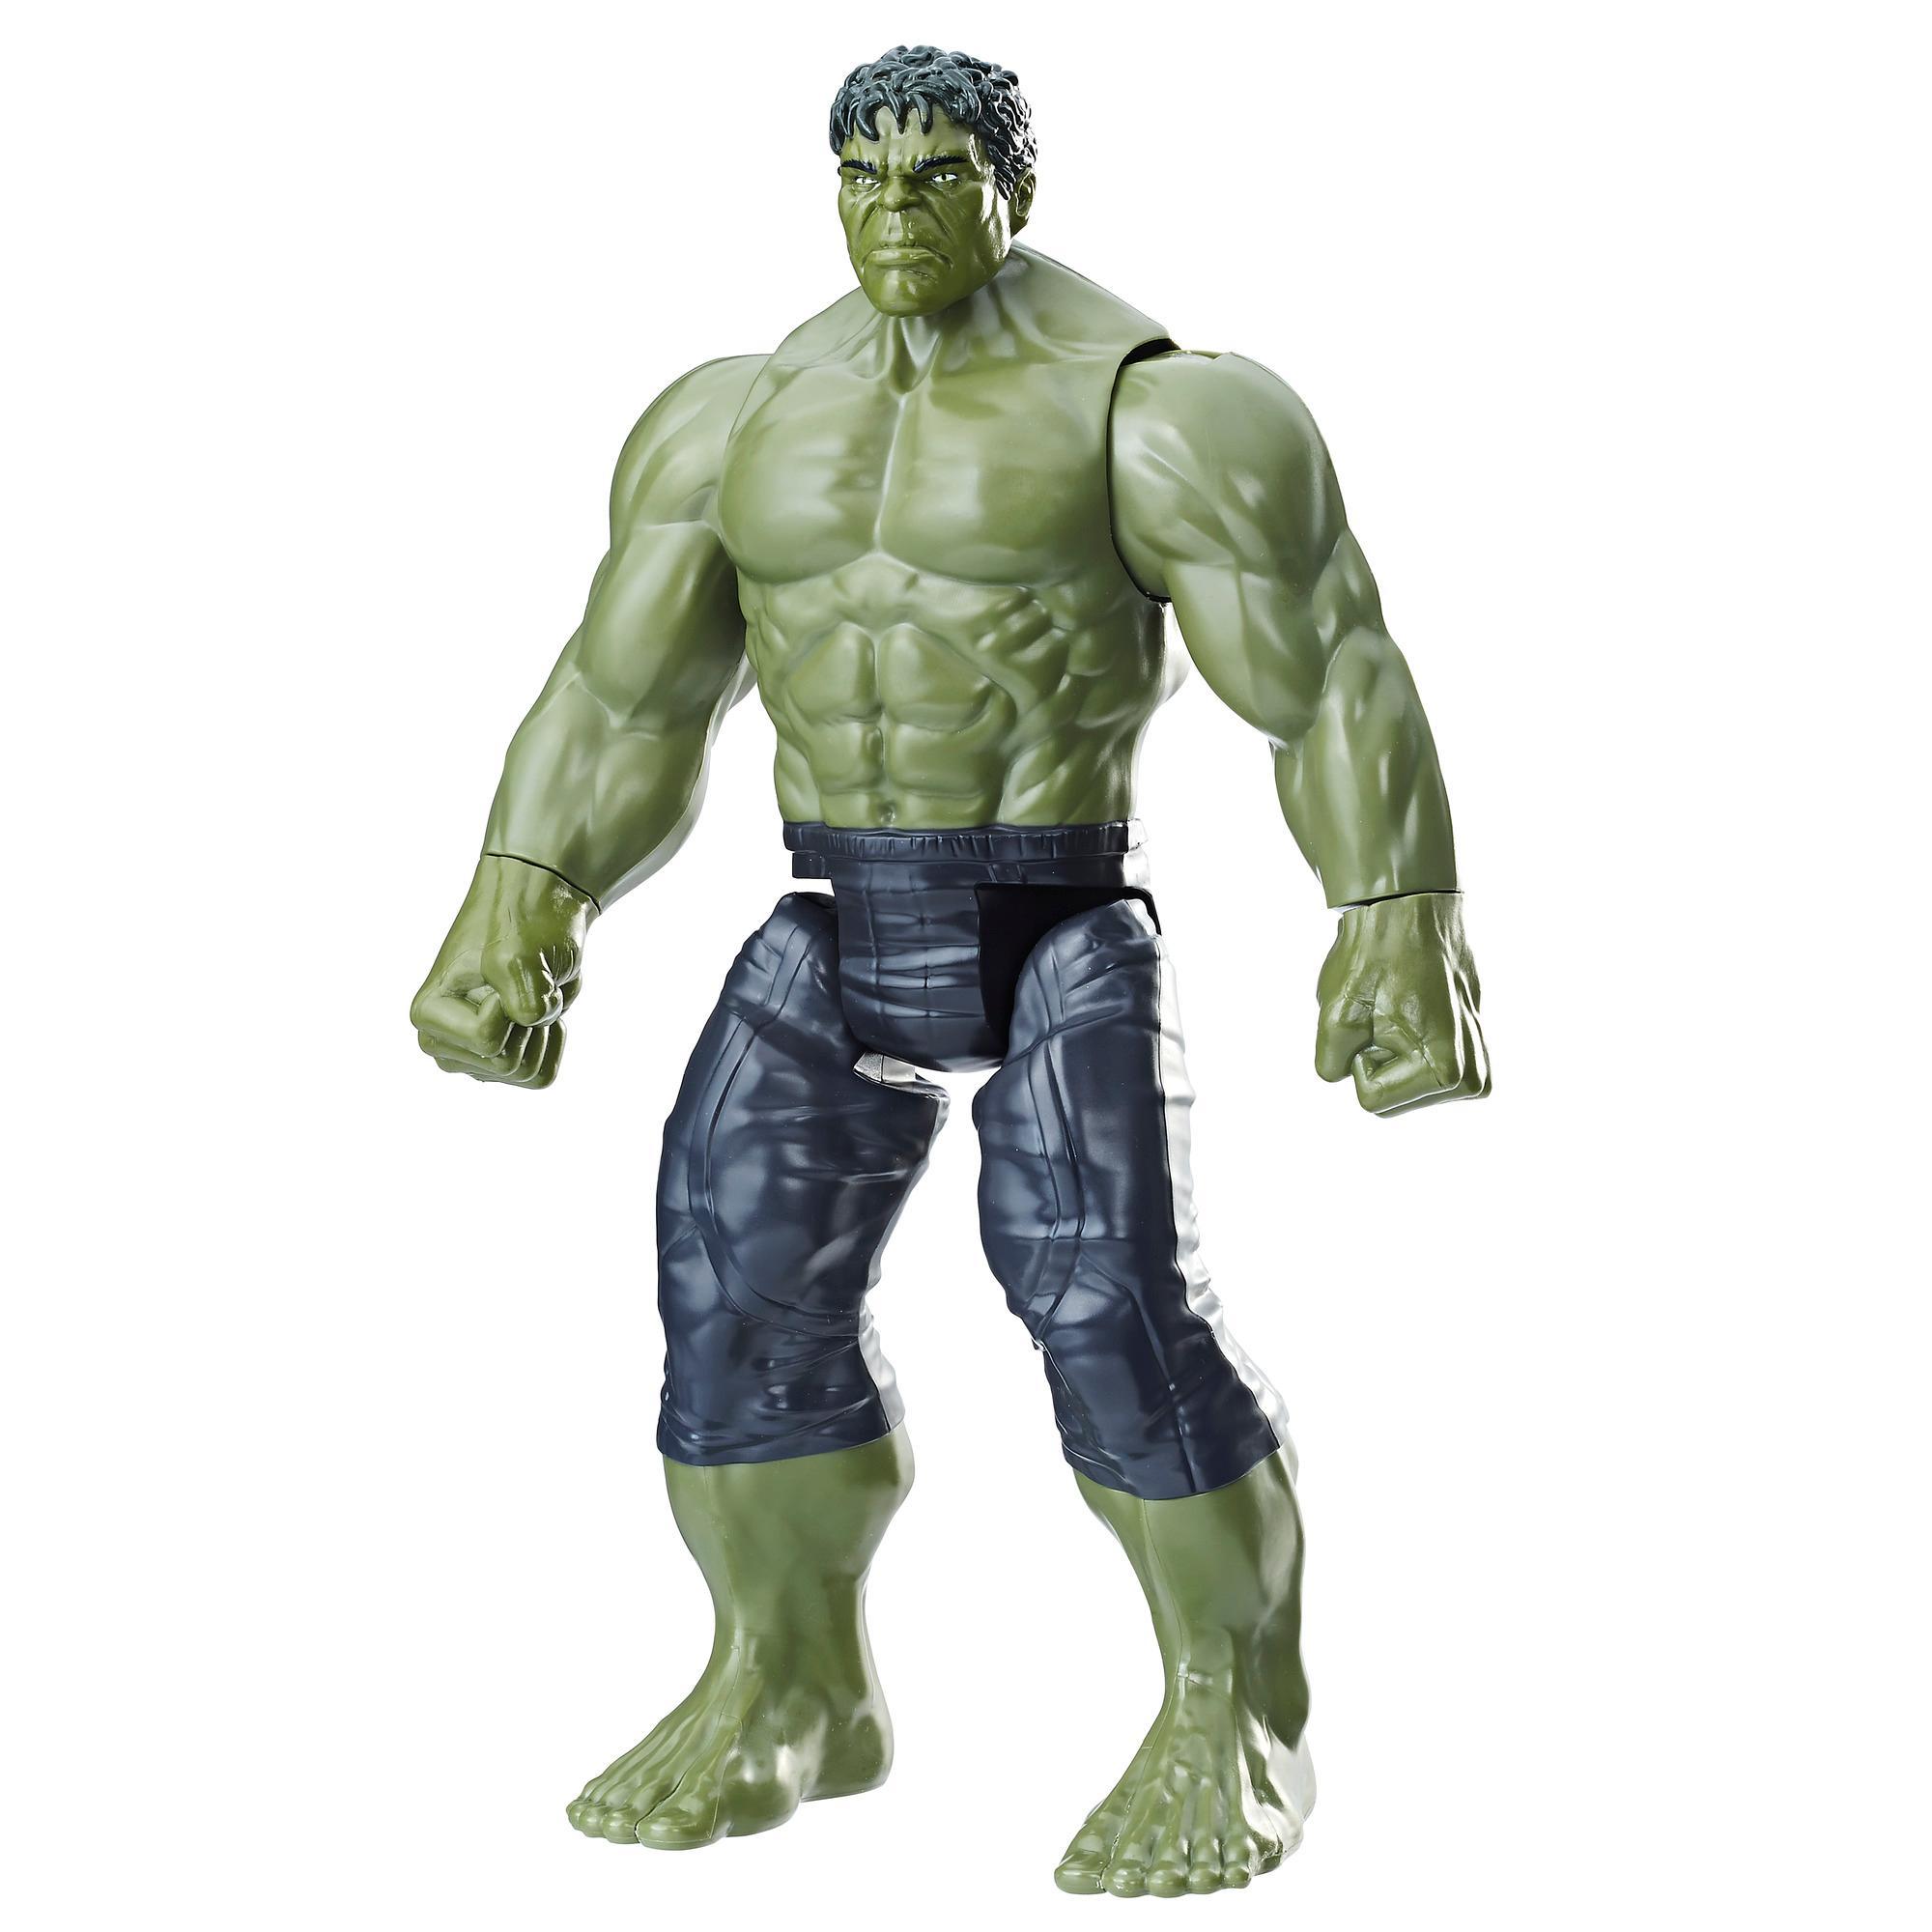 Marvel Infinity War Titan Hero Series - Hulk con puerto para Titan Hero Power FX